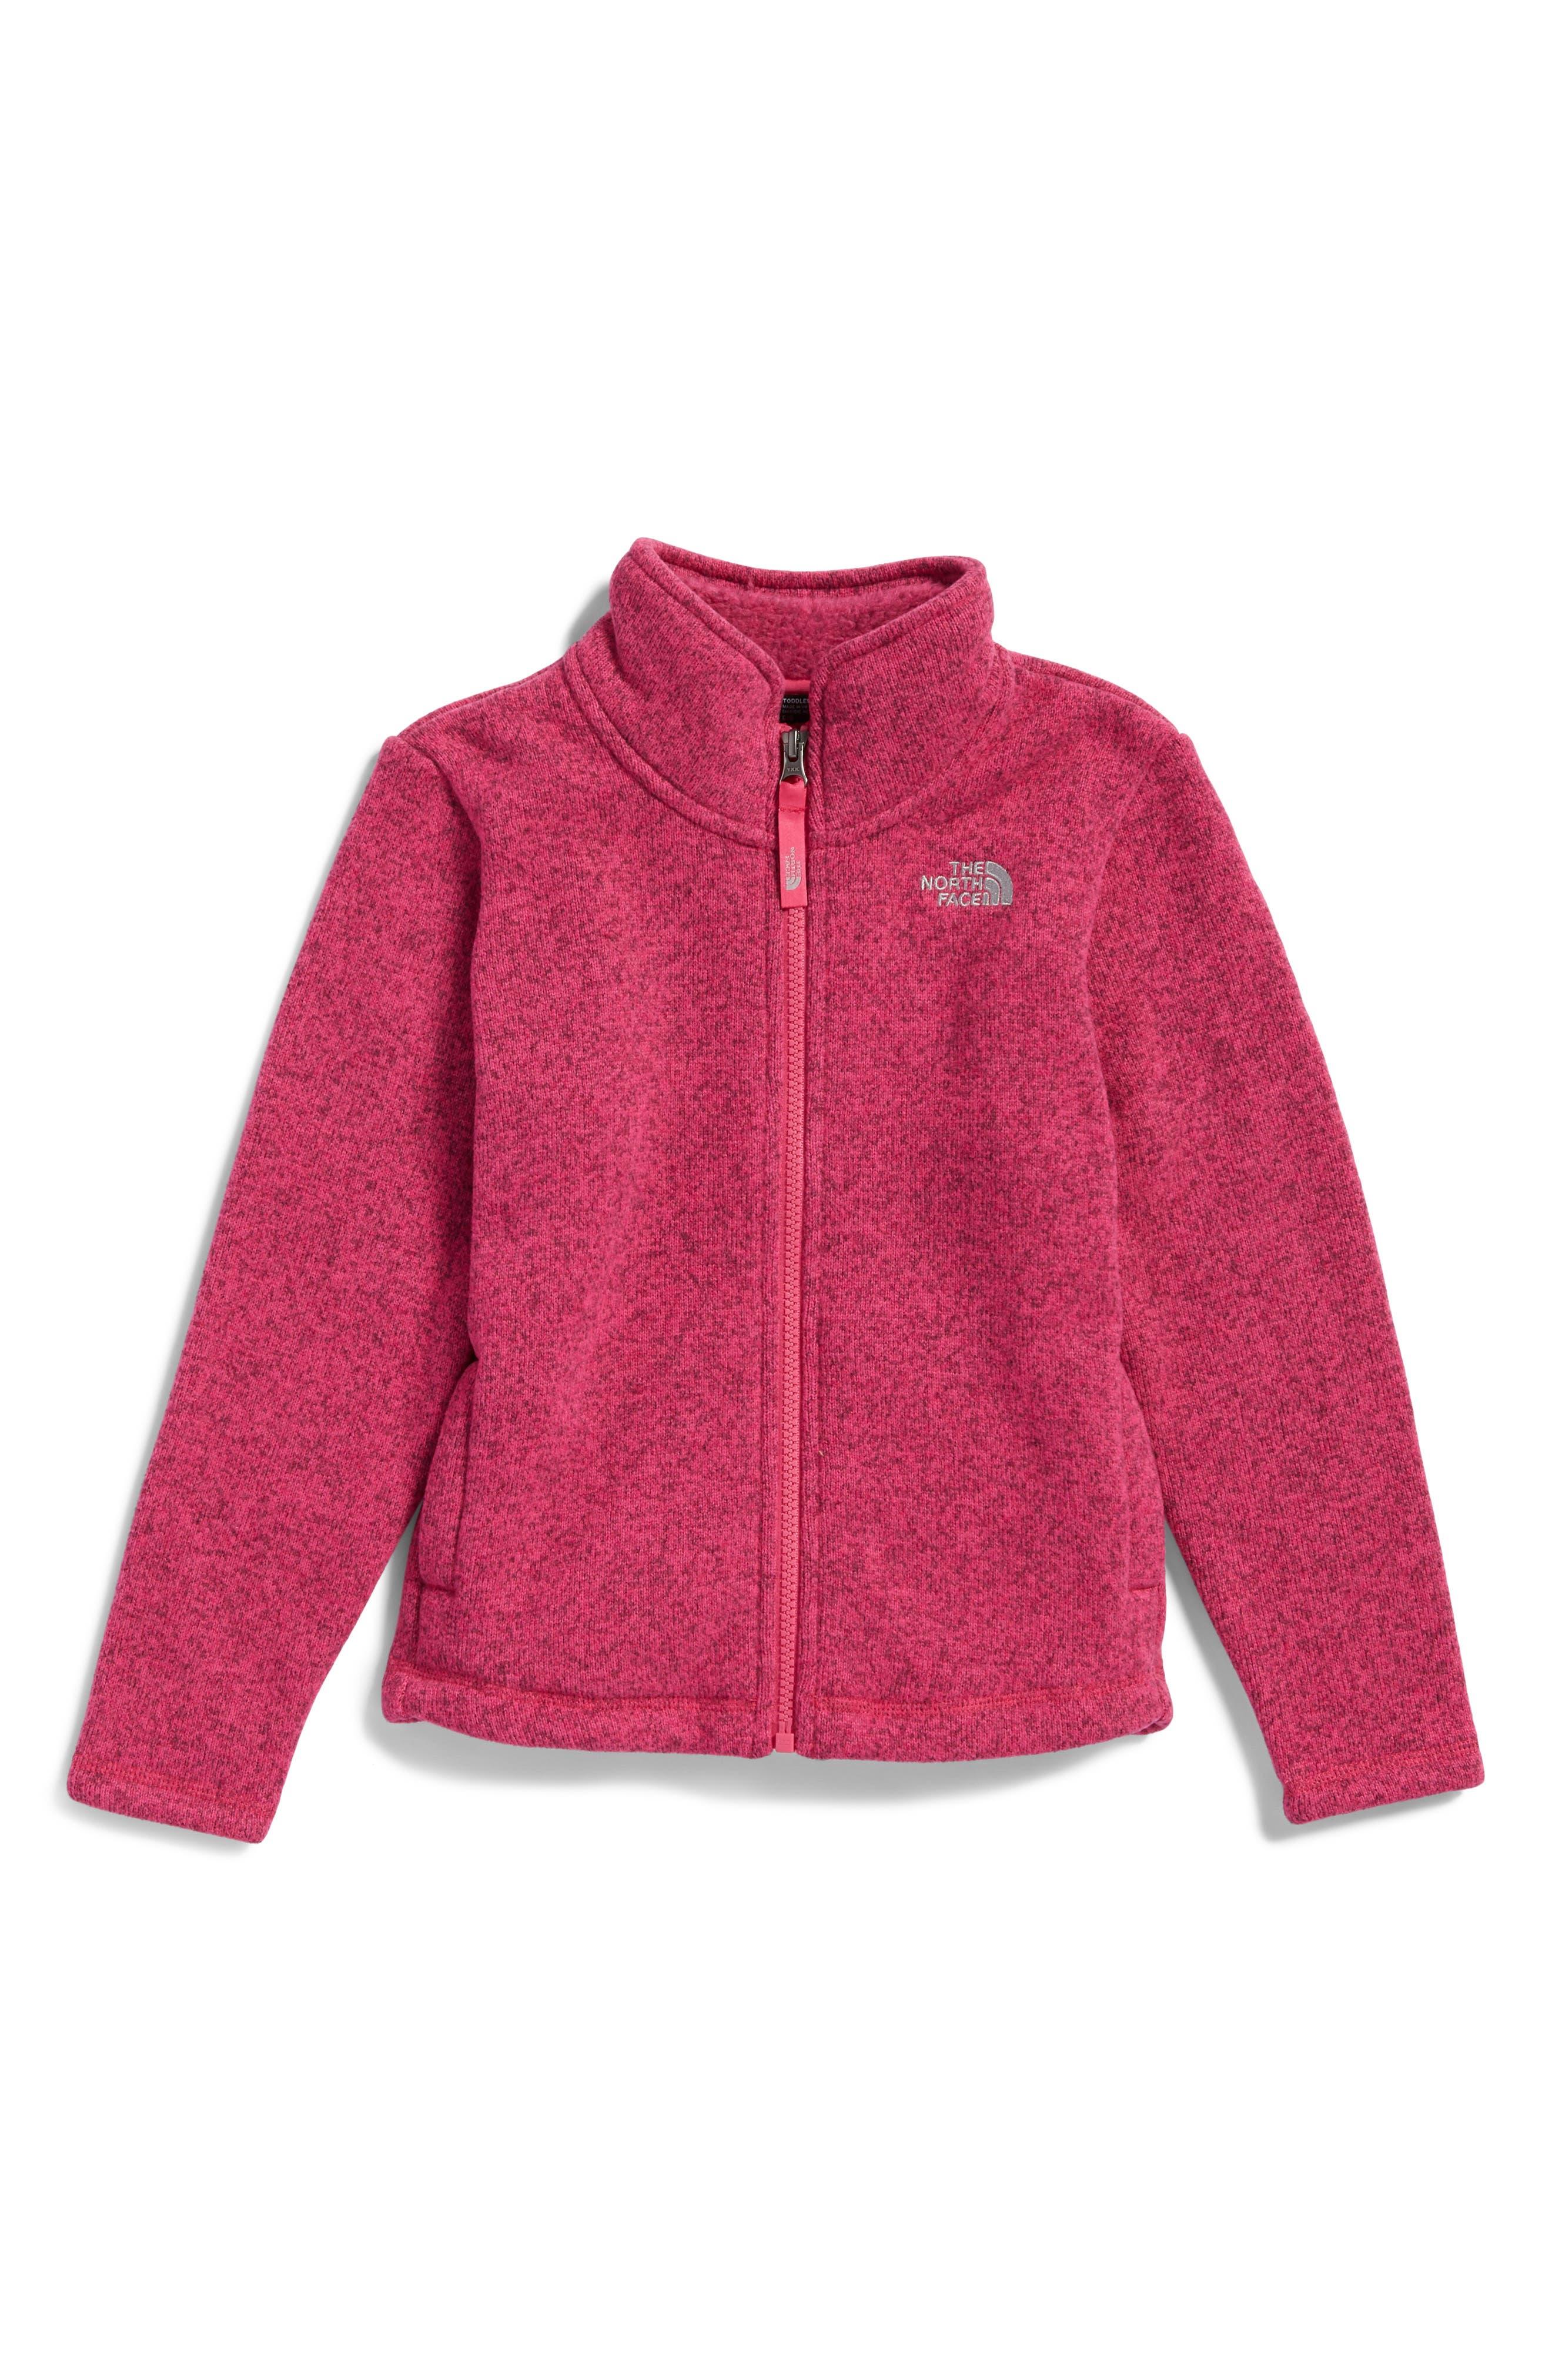 Alternate Image 1 Selected - The North Face Crescent Fleece Jacket (Toddler Girls & Little Girls)